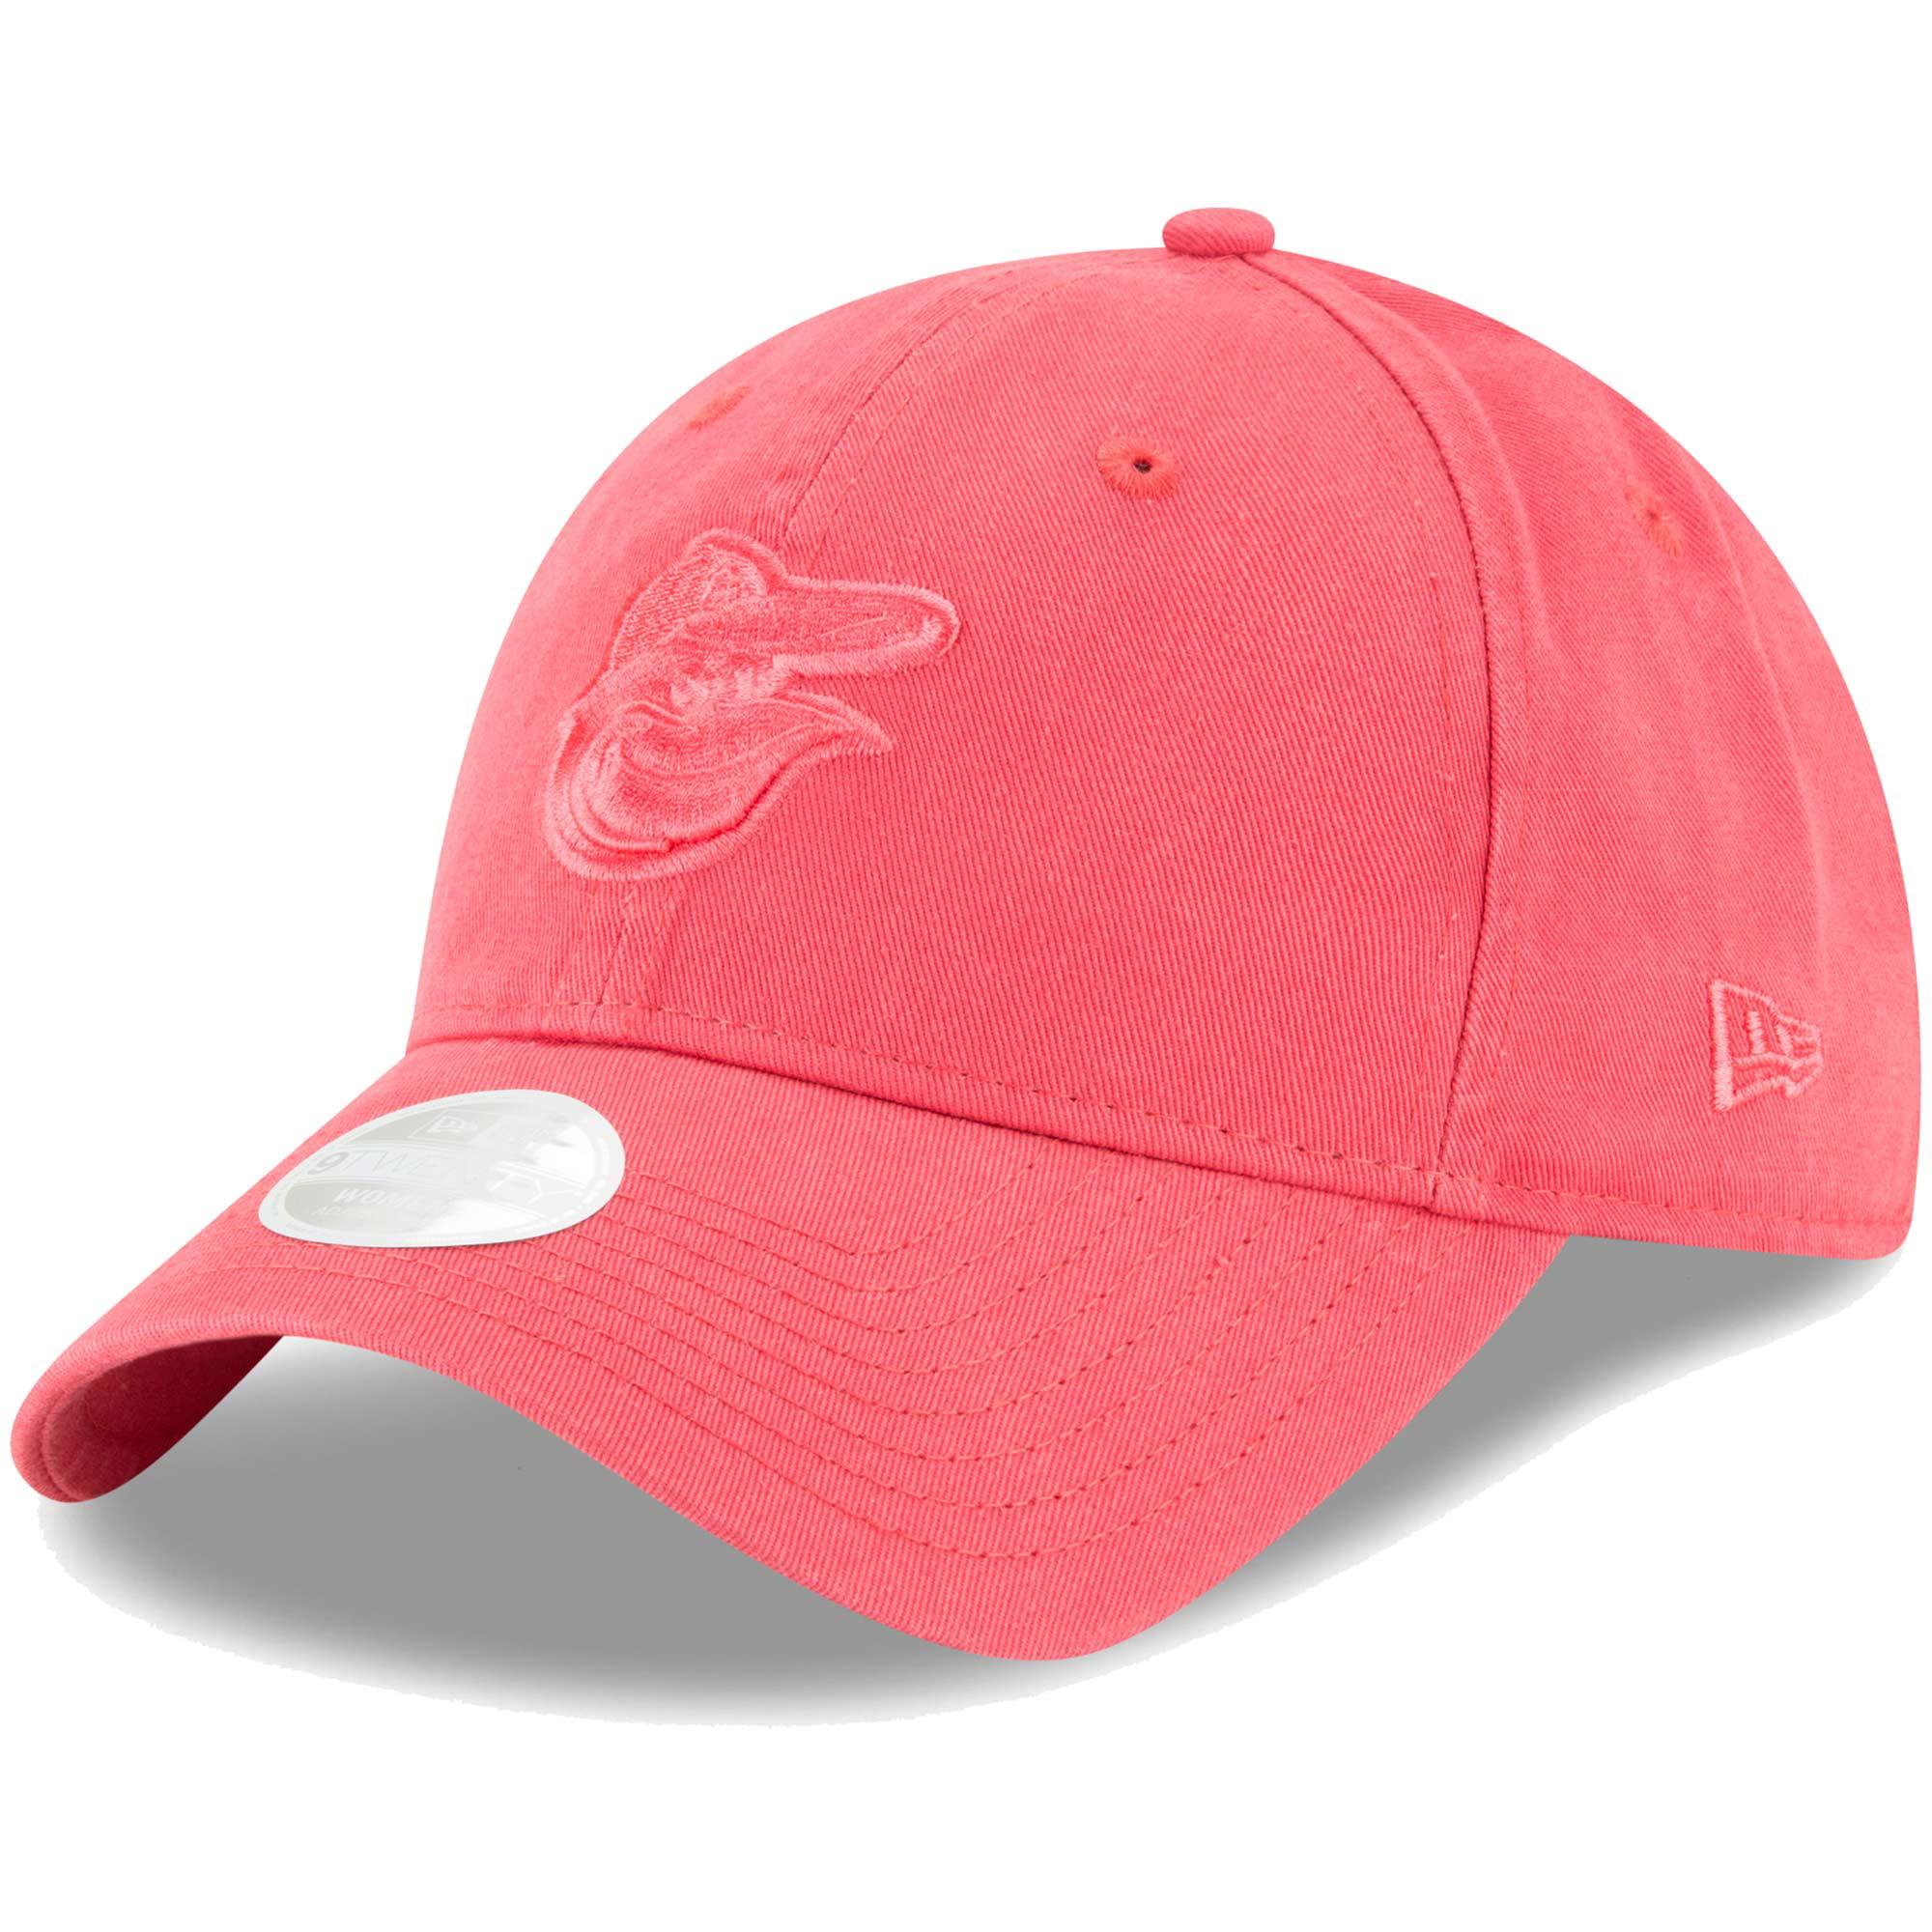 Baltimore Orioles New Era Women's Core Classic Twill 9TWENTY Adjustable Hat - Pink - OSFA